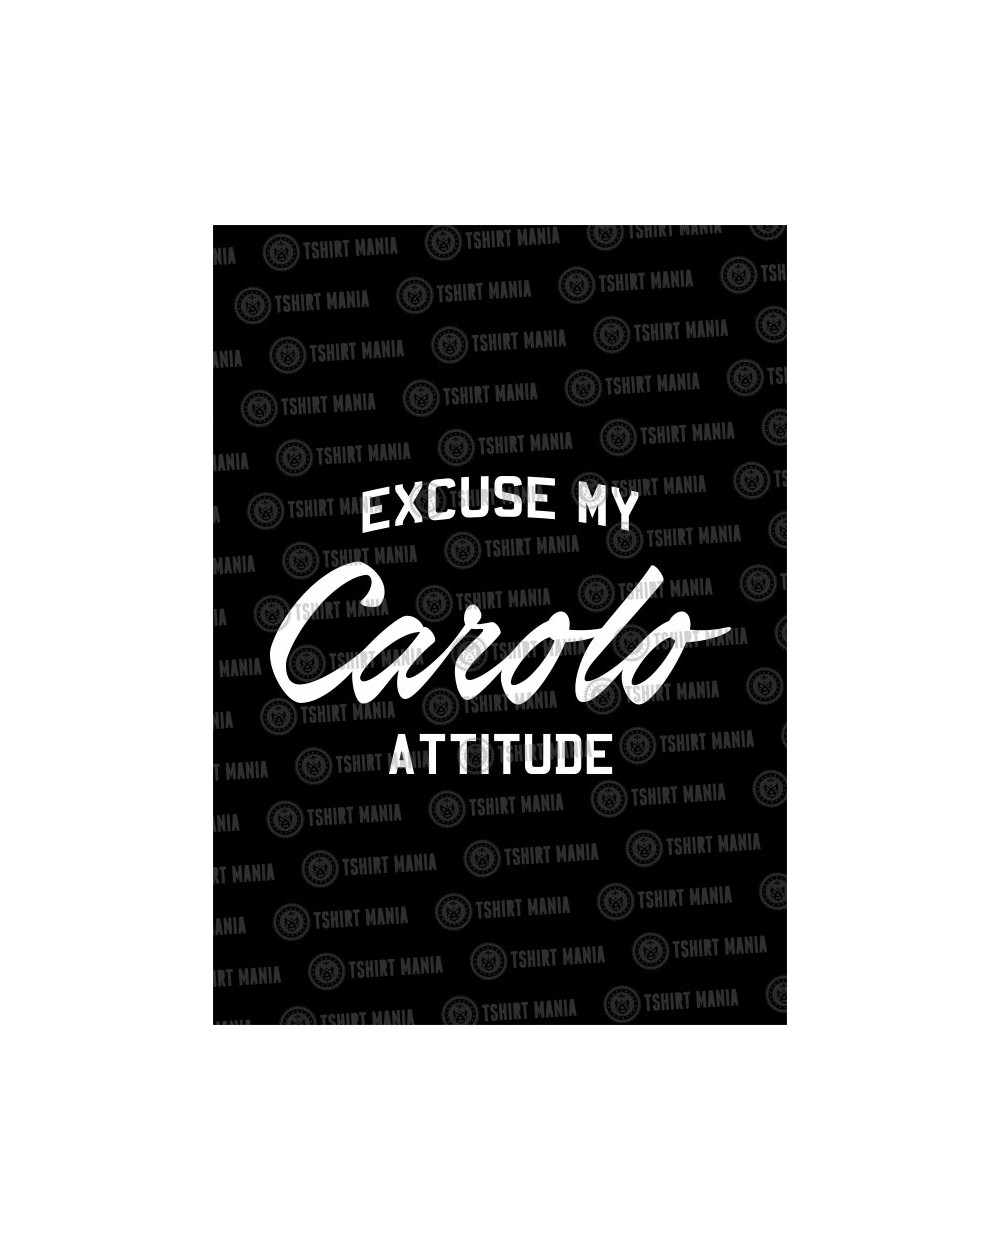 excuse my carolo attitude homme